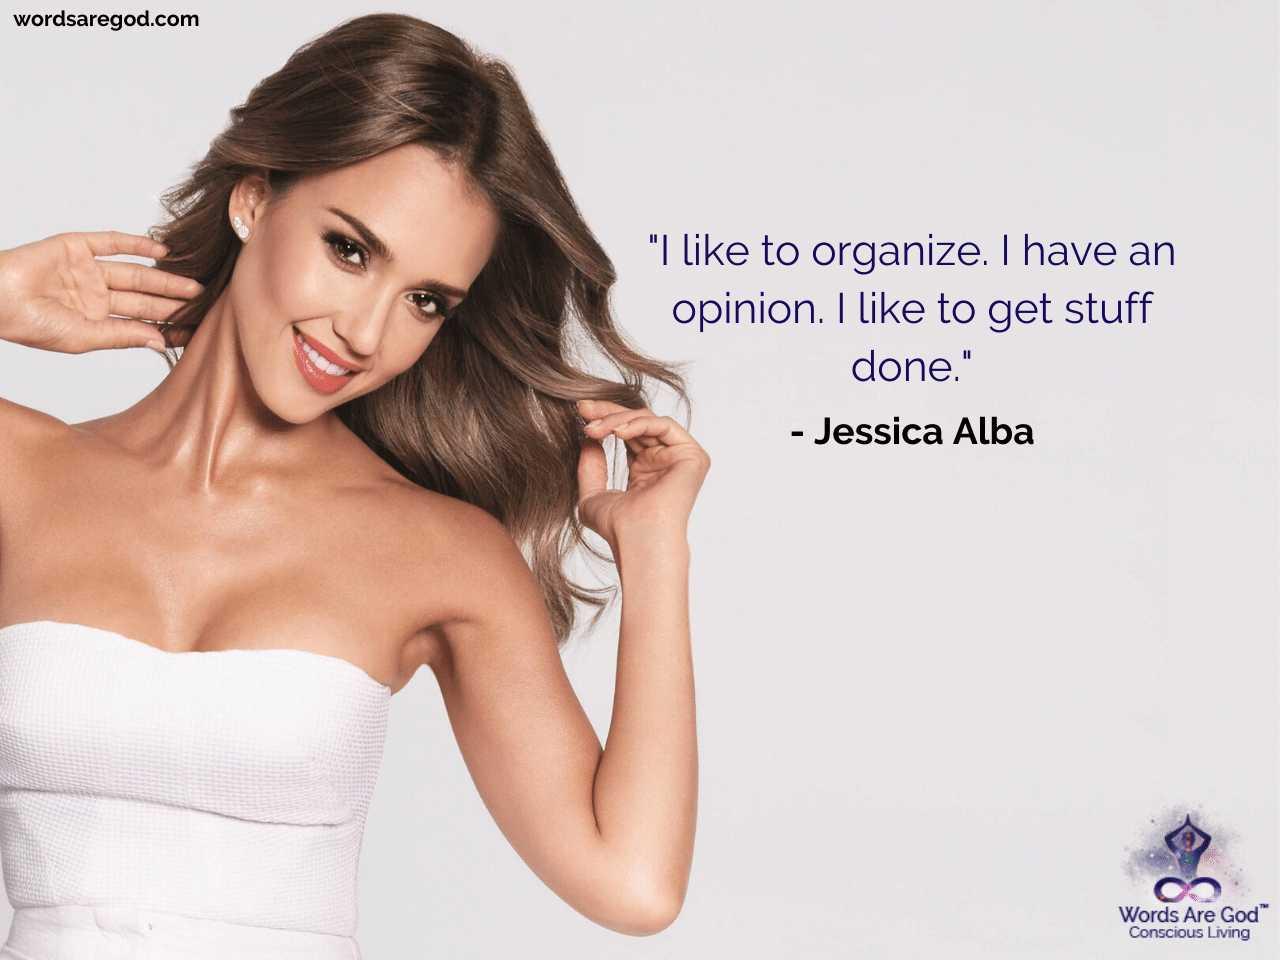 Jessica Alba Motivational Quotes